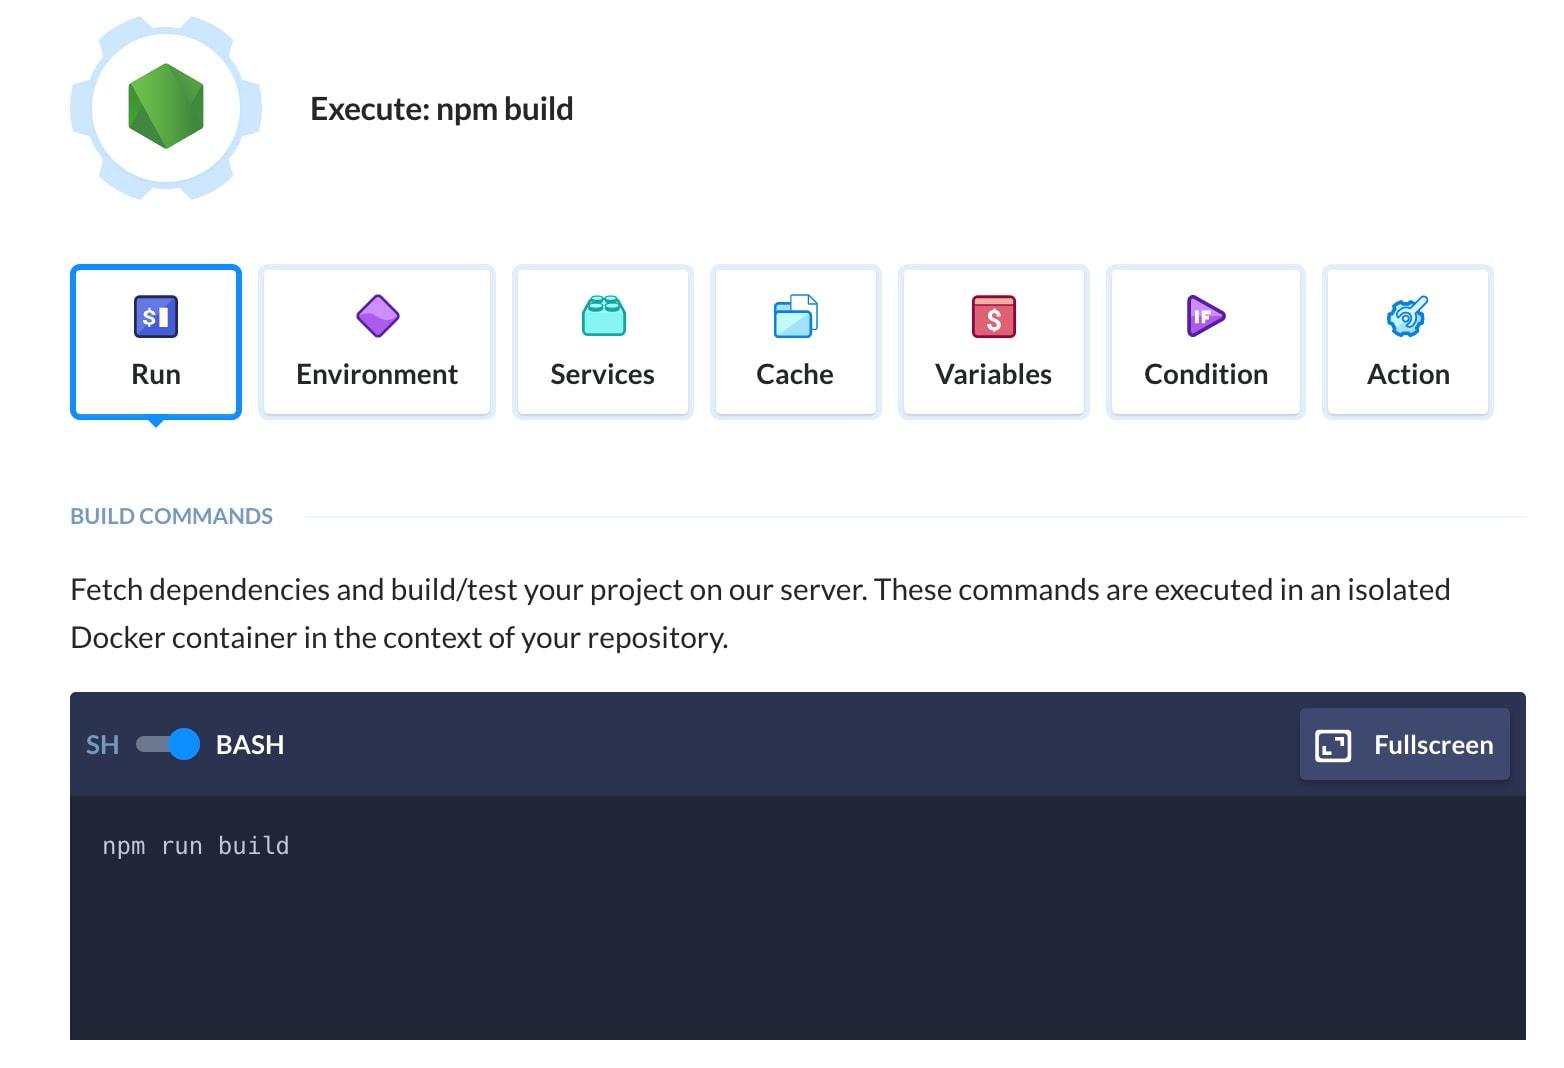 NPM Build on Buddy